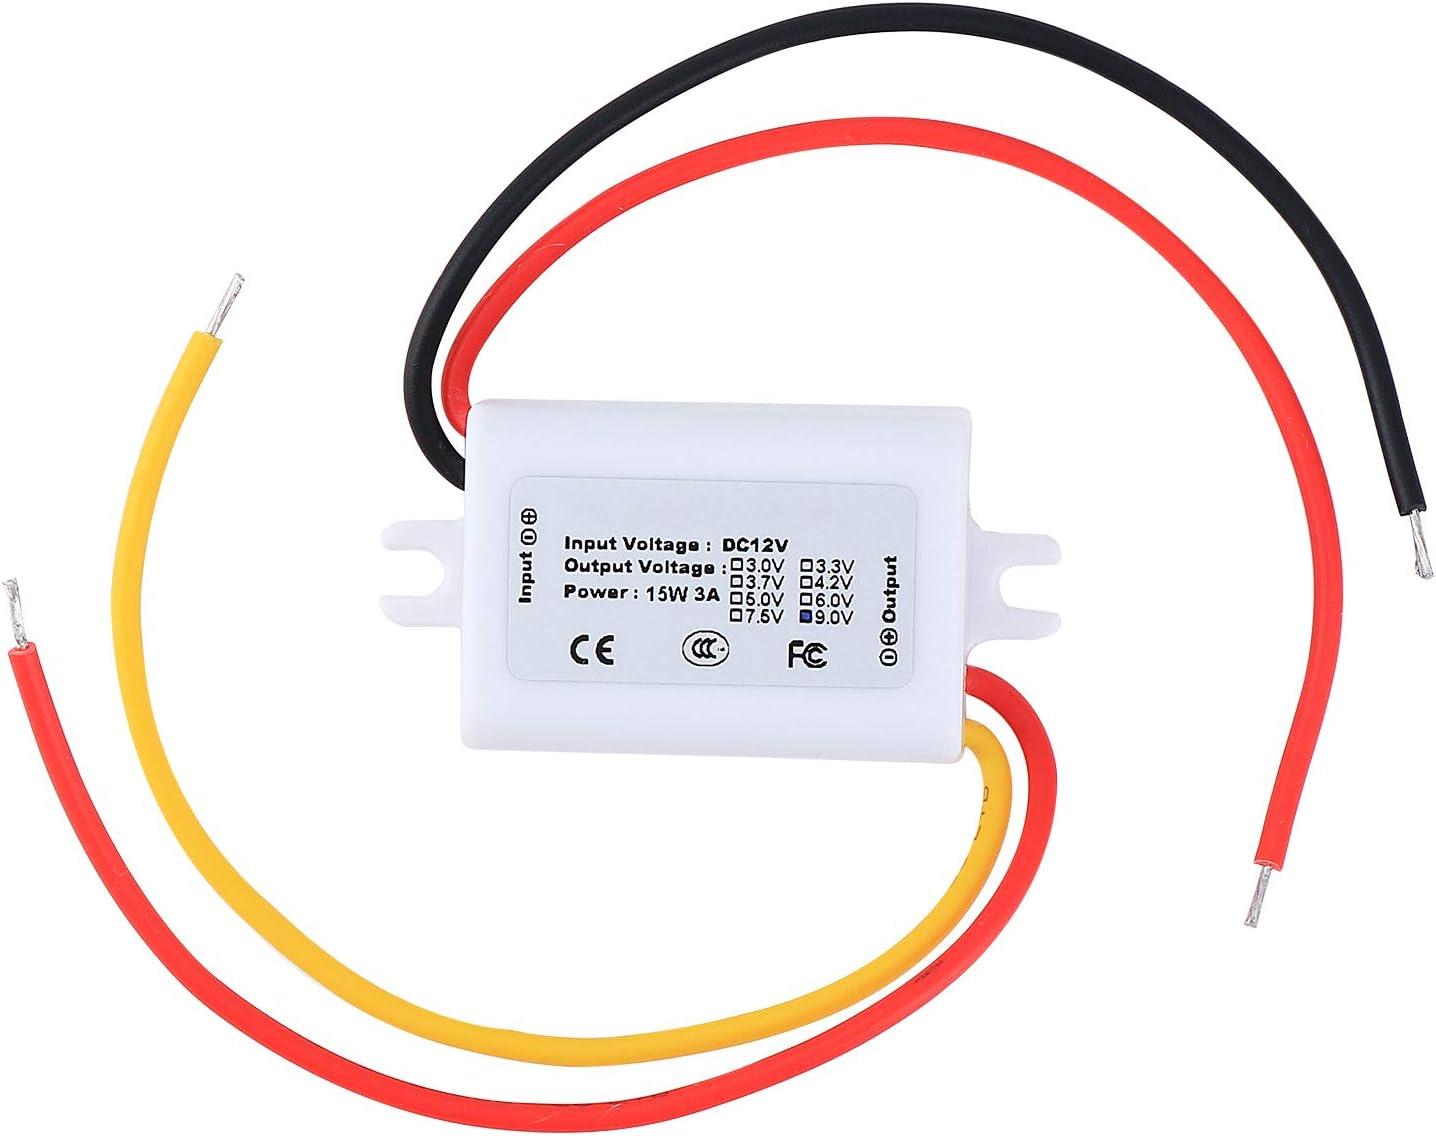 HSEAMALL DC//DC 12V to 9V 2A Power Supply Converter for Car LED Display White